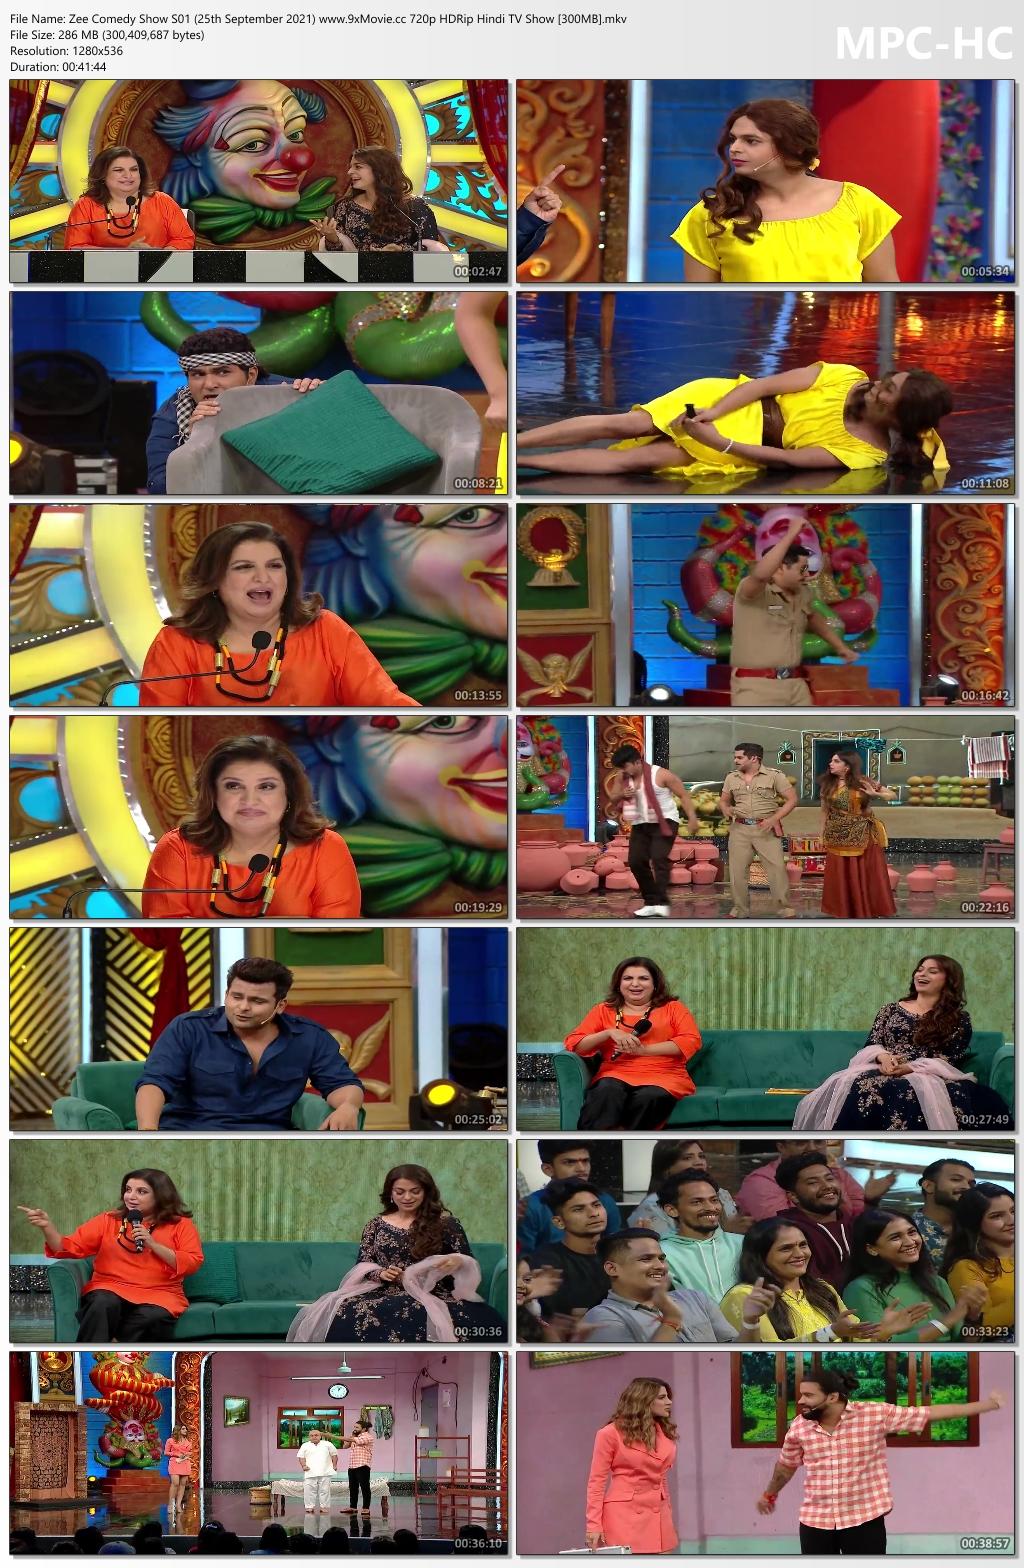 Zee-Comedy-Show-S01-25th-September-2021-www-9x-Movie-cc-720p-HDRip-Hindi-TV-Show-300-MB-mkv